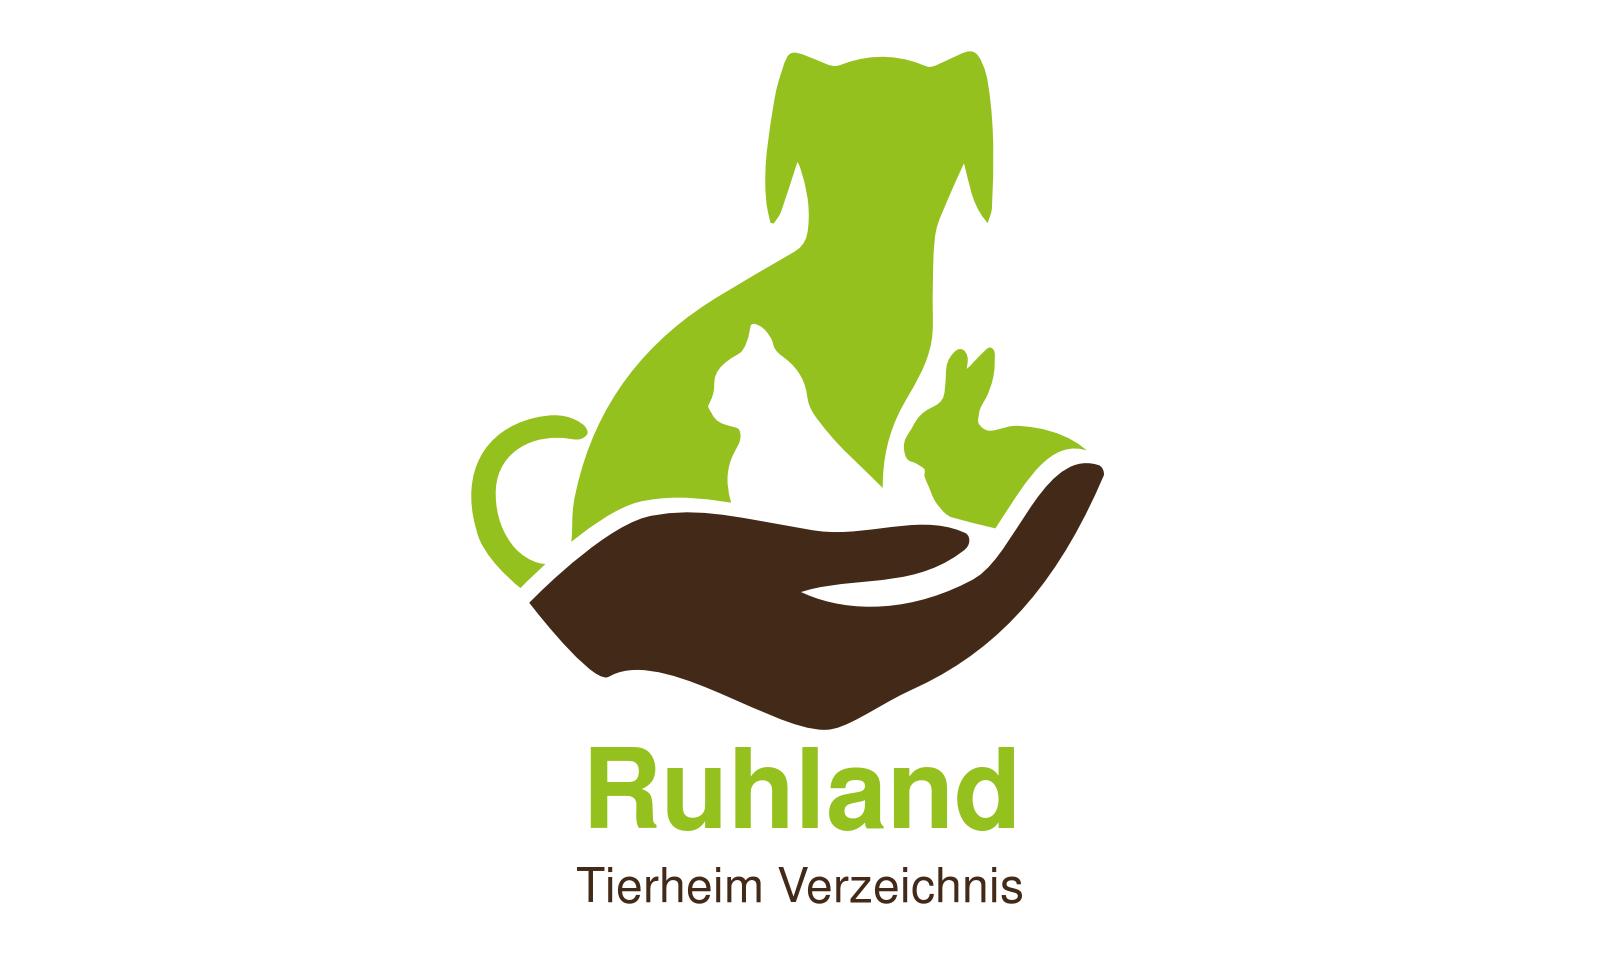 Tierheim Ruhland